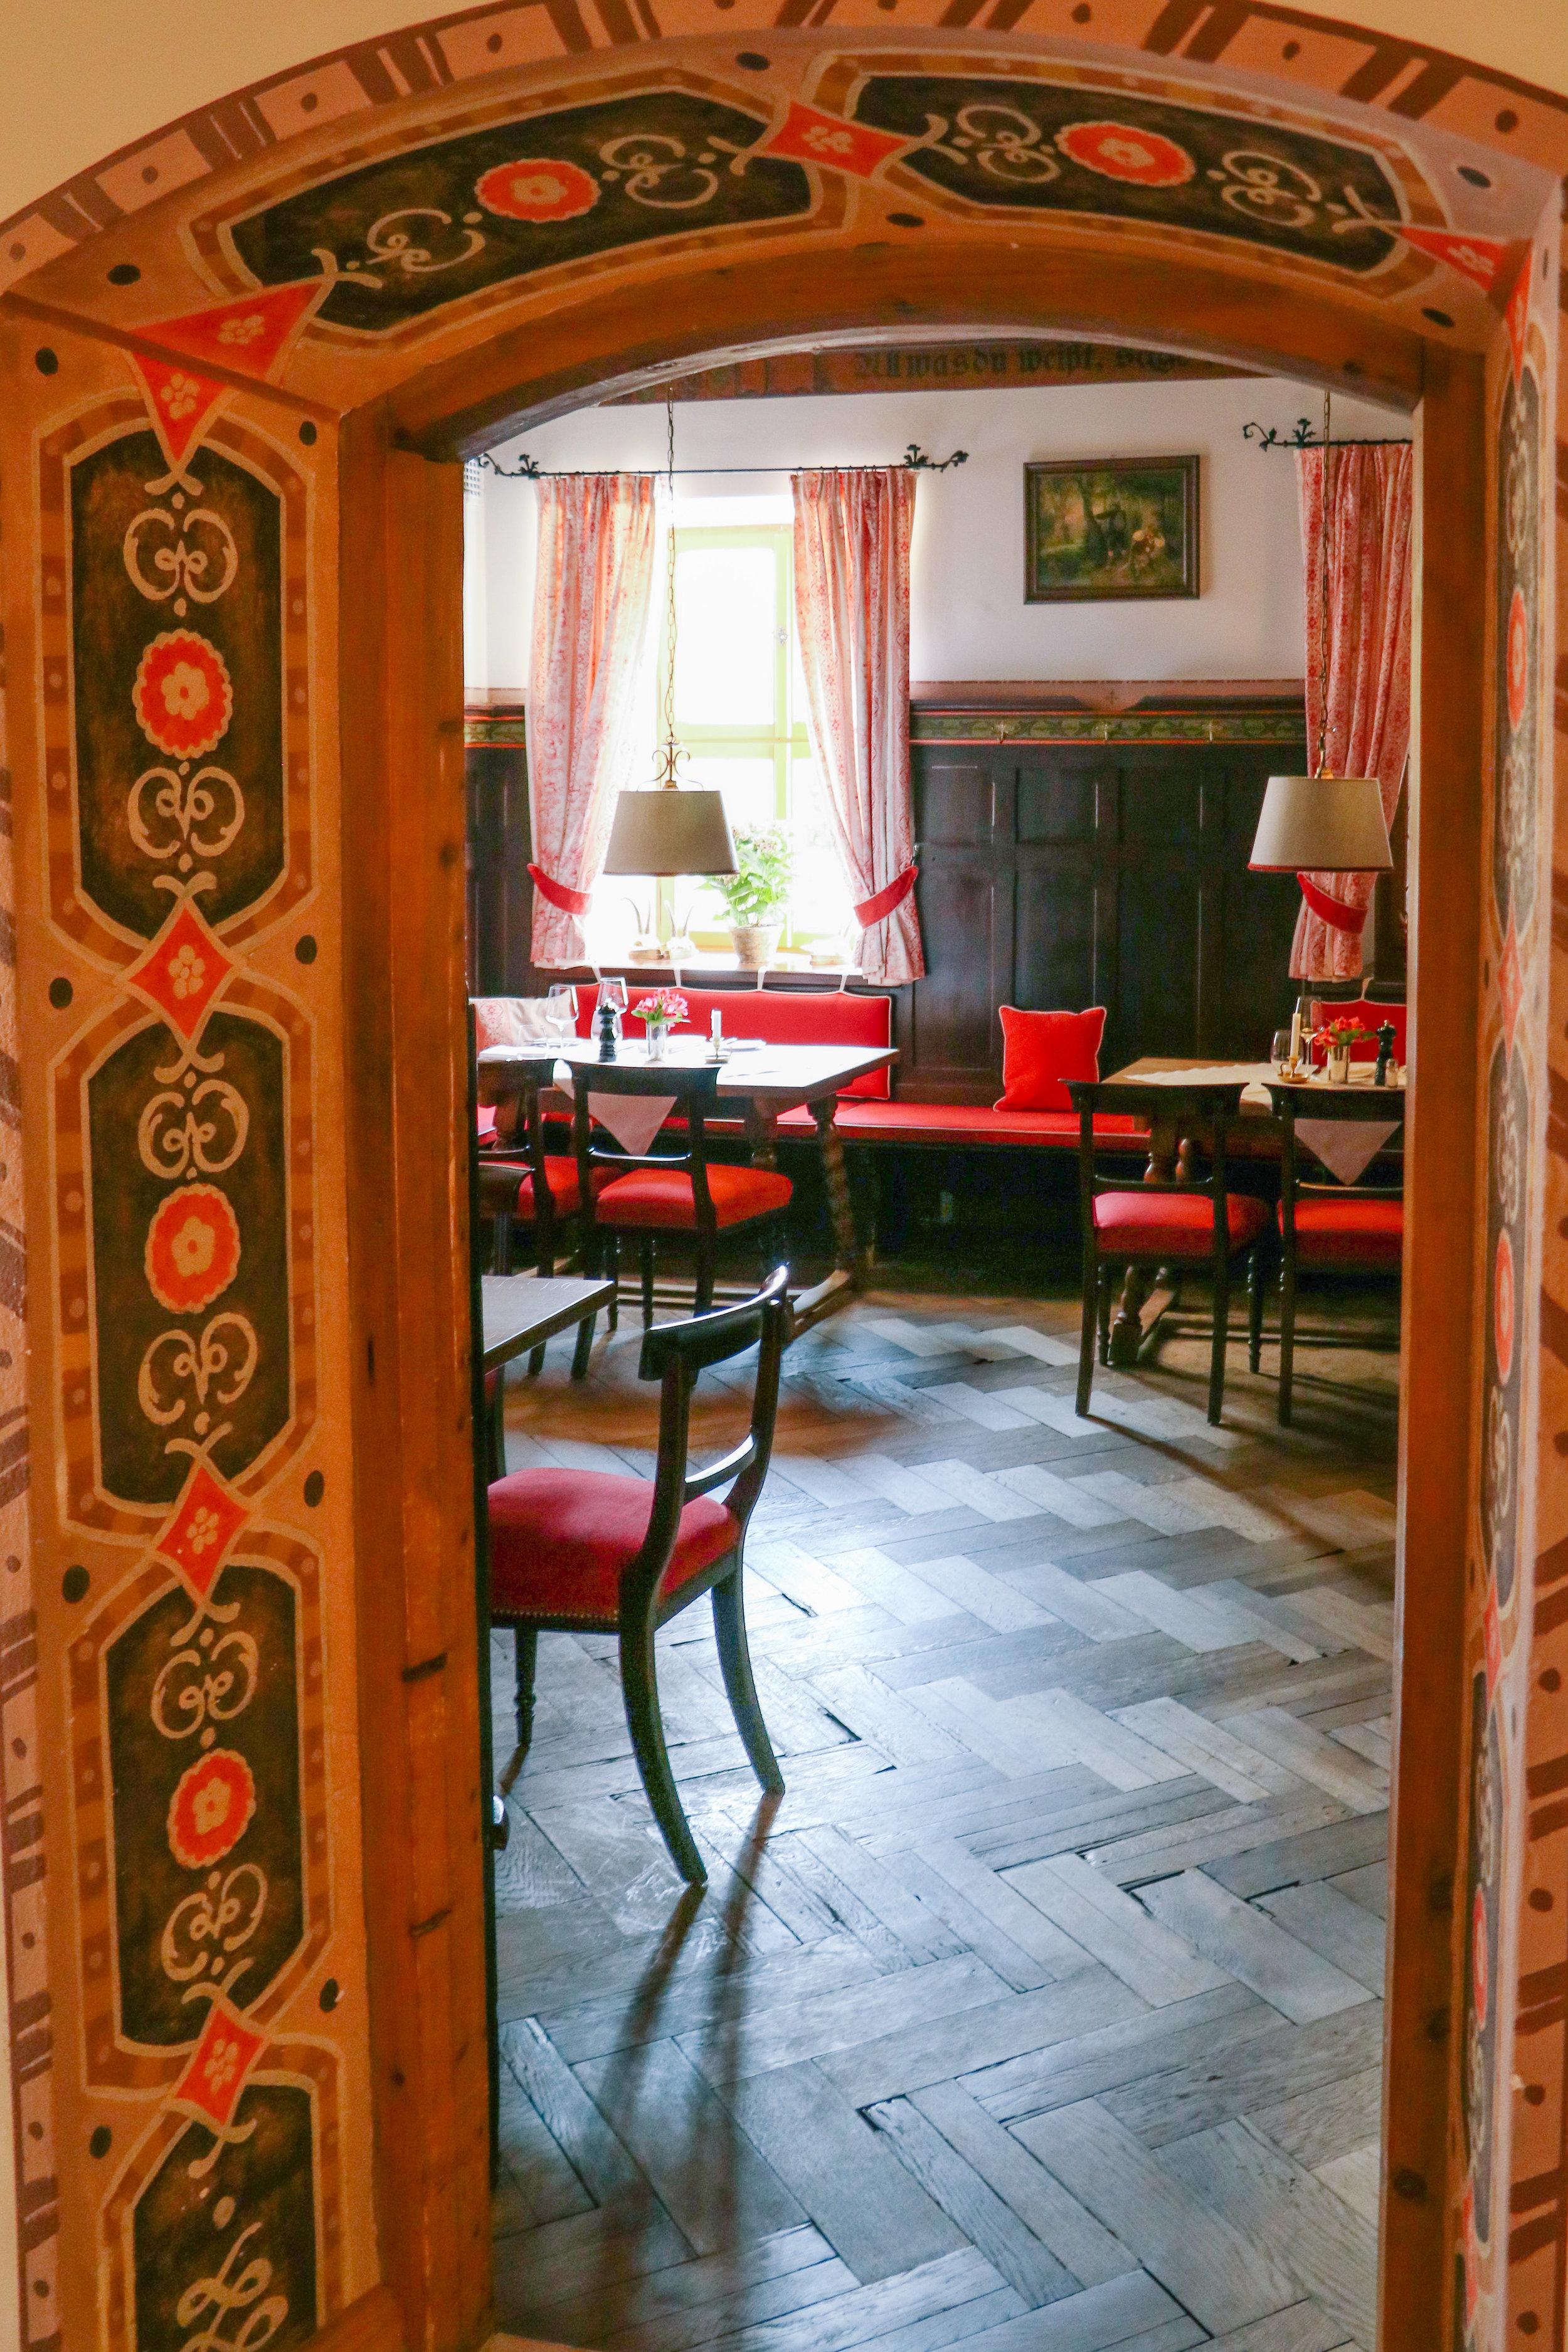 Hotel Spotlight: Bavaria's Hotel Bachmair Weissach - by Courtney Brown